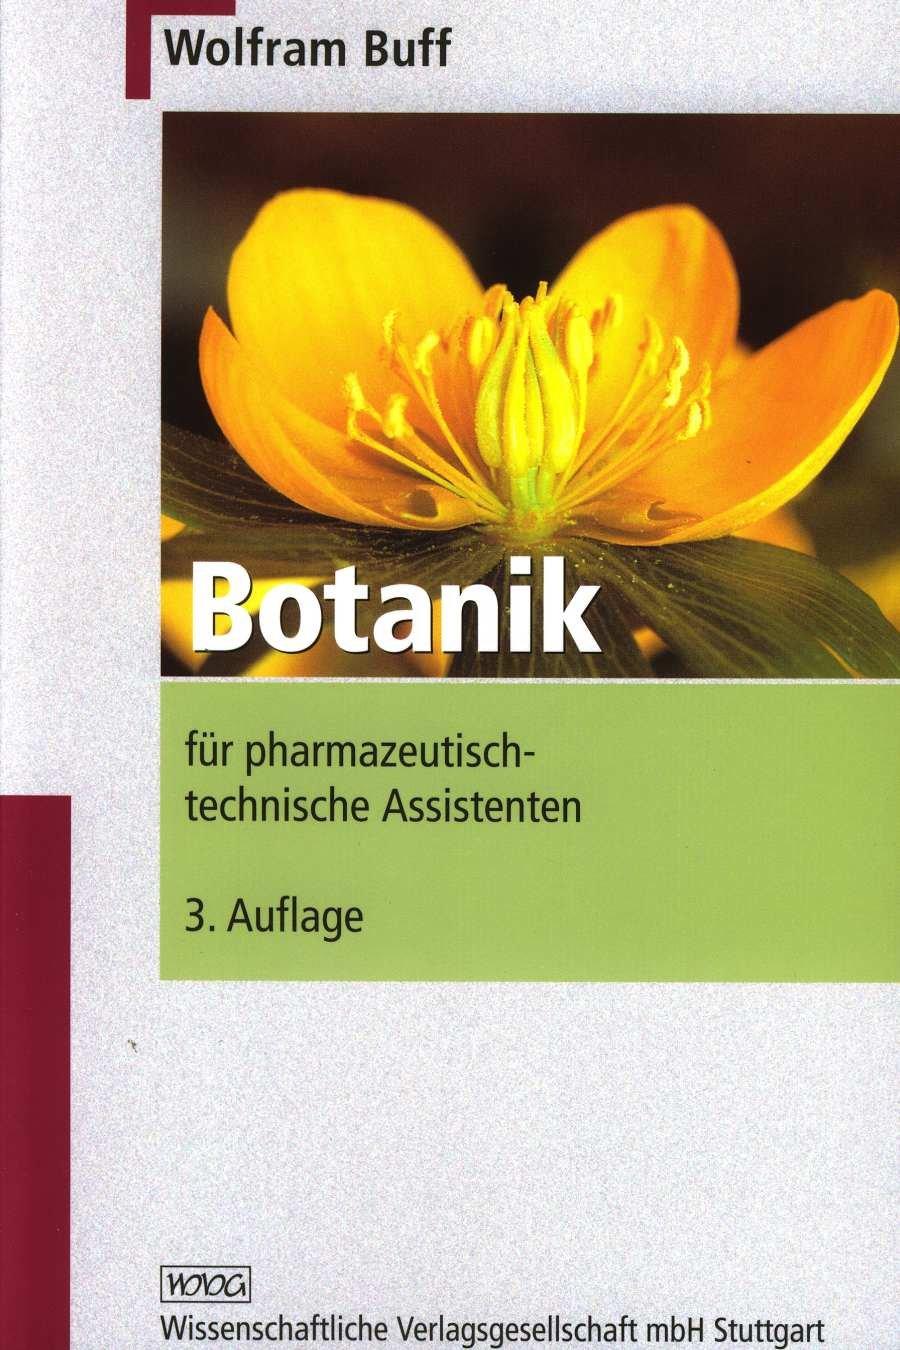 Botanik - Shop - Mediengruppe Deutscher Apotheker Verlag